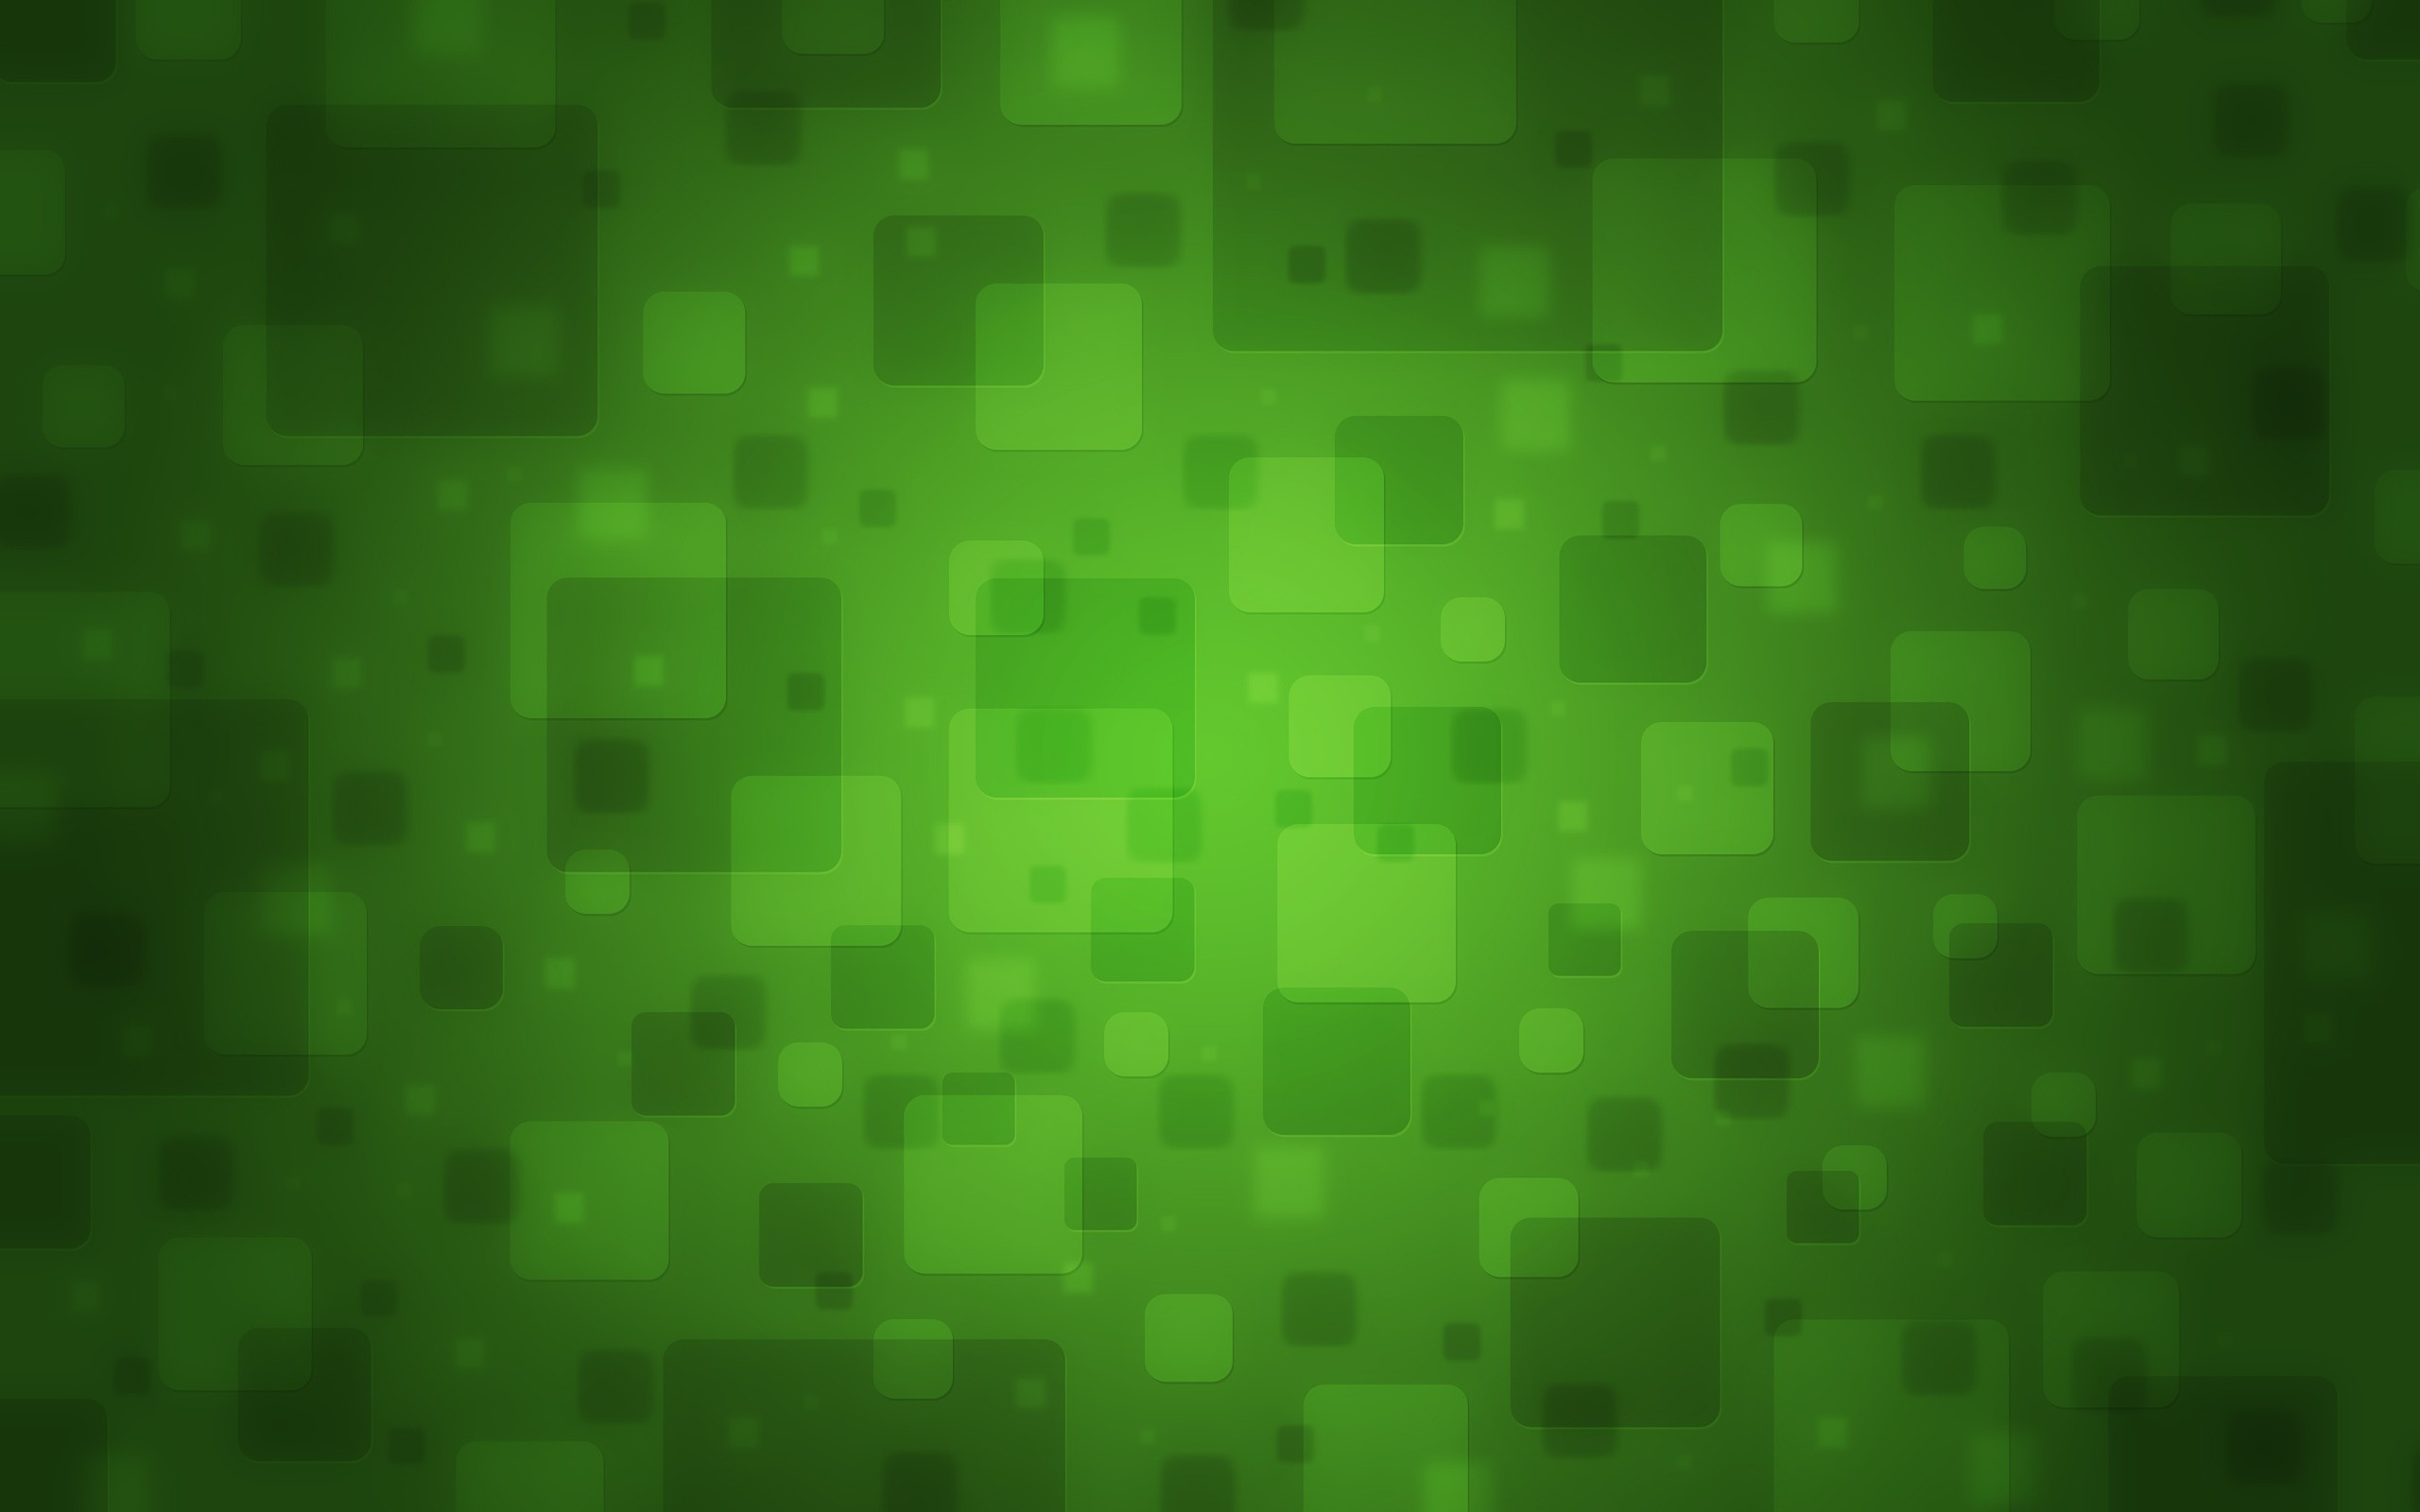 General 2560x1600 minimalism digital art green background square green